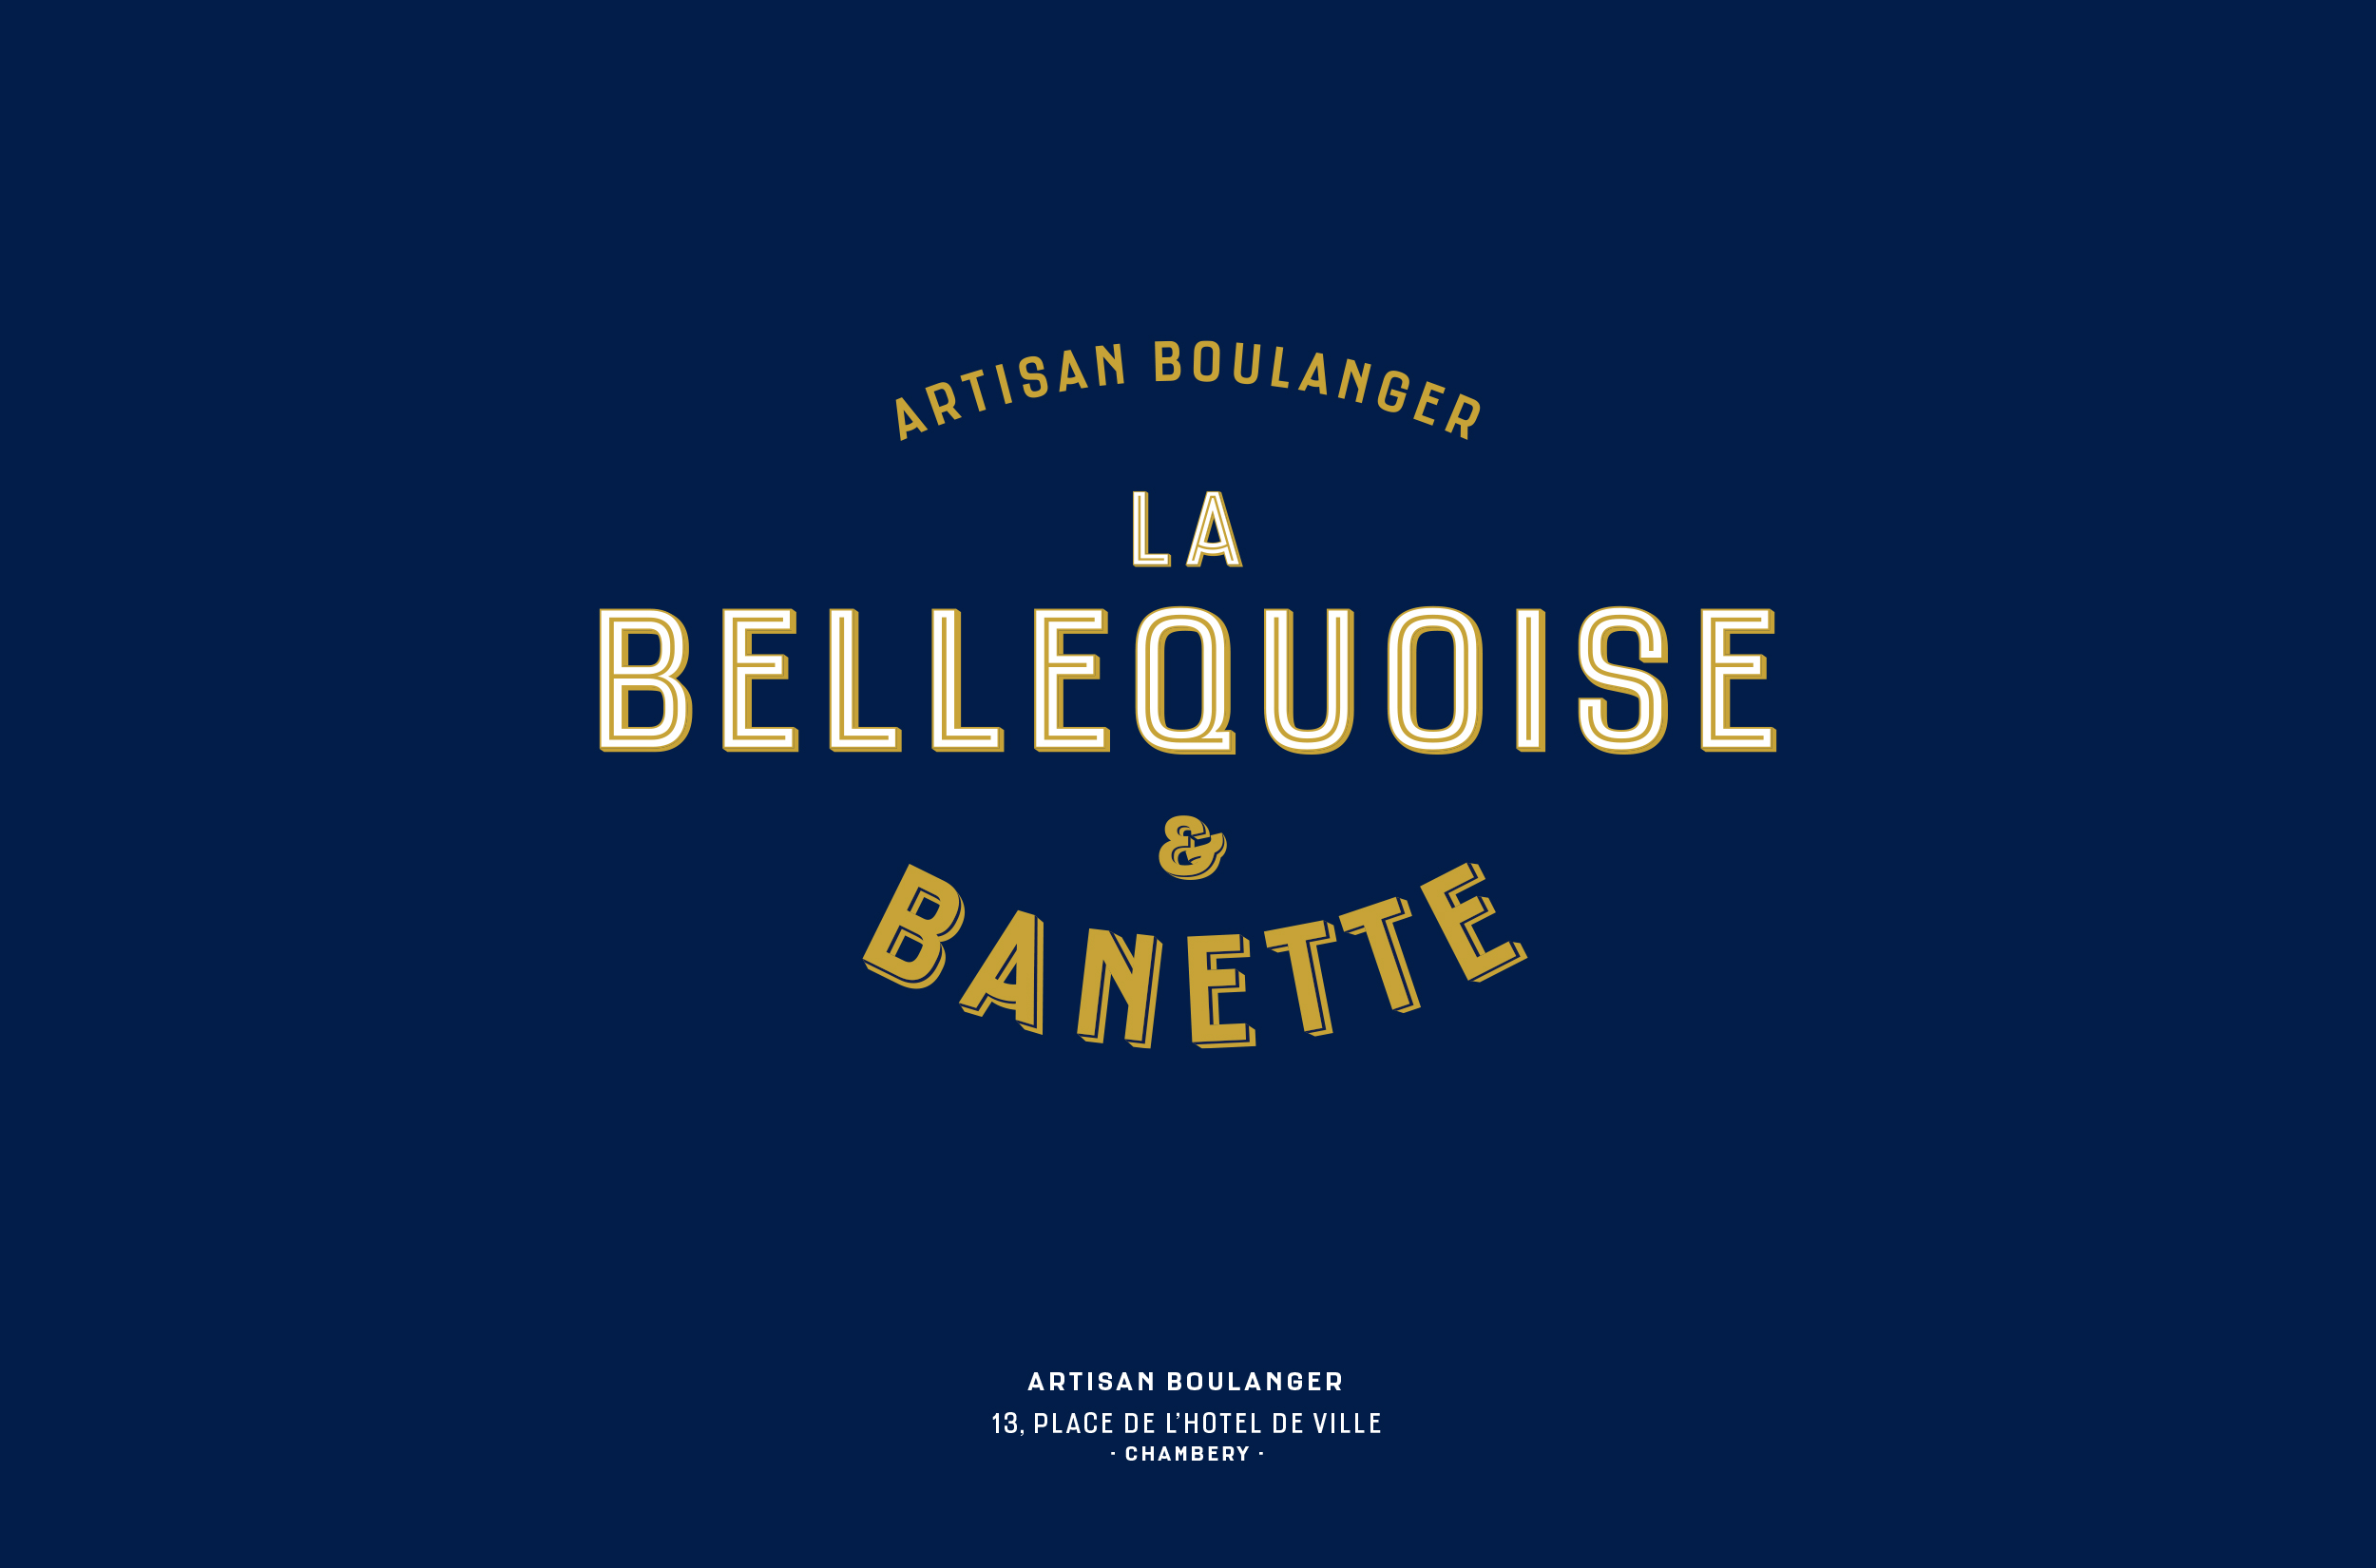 Banette & Moi - 1